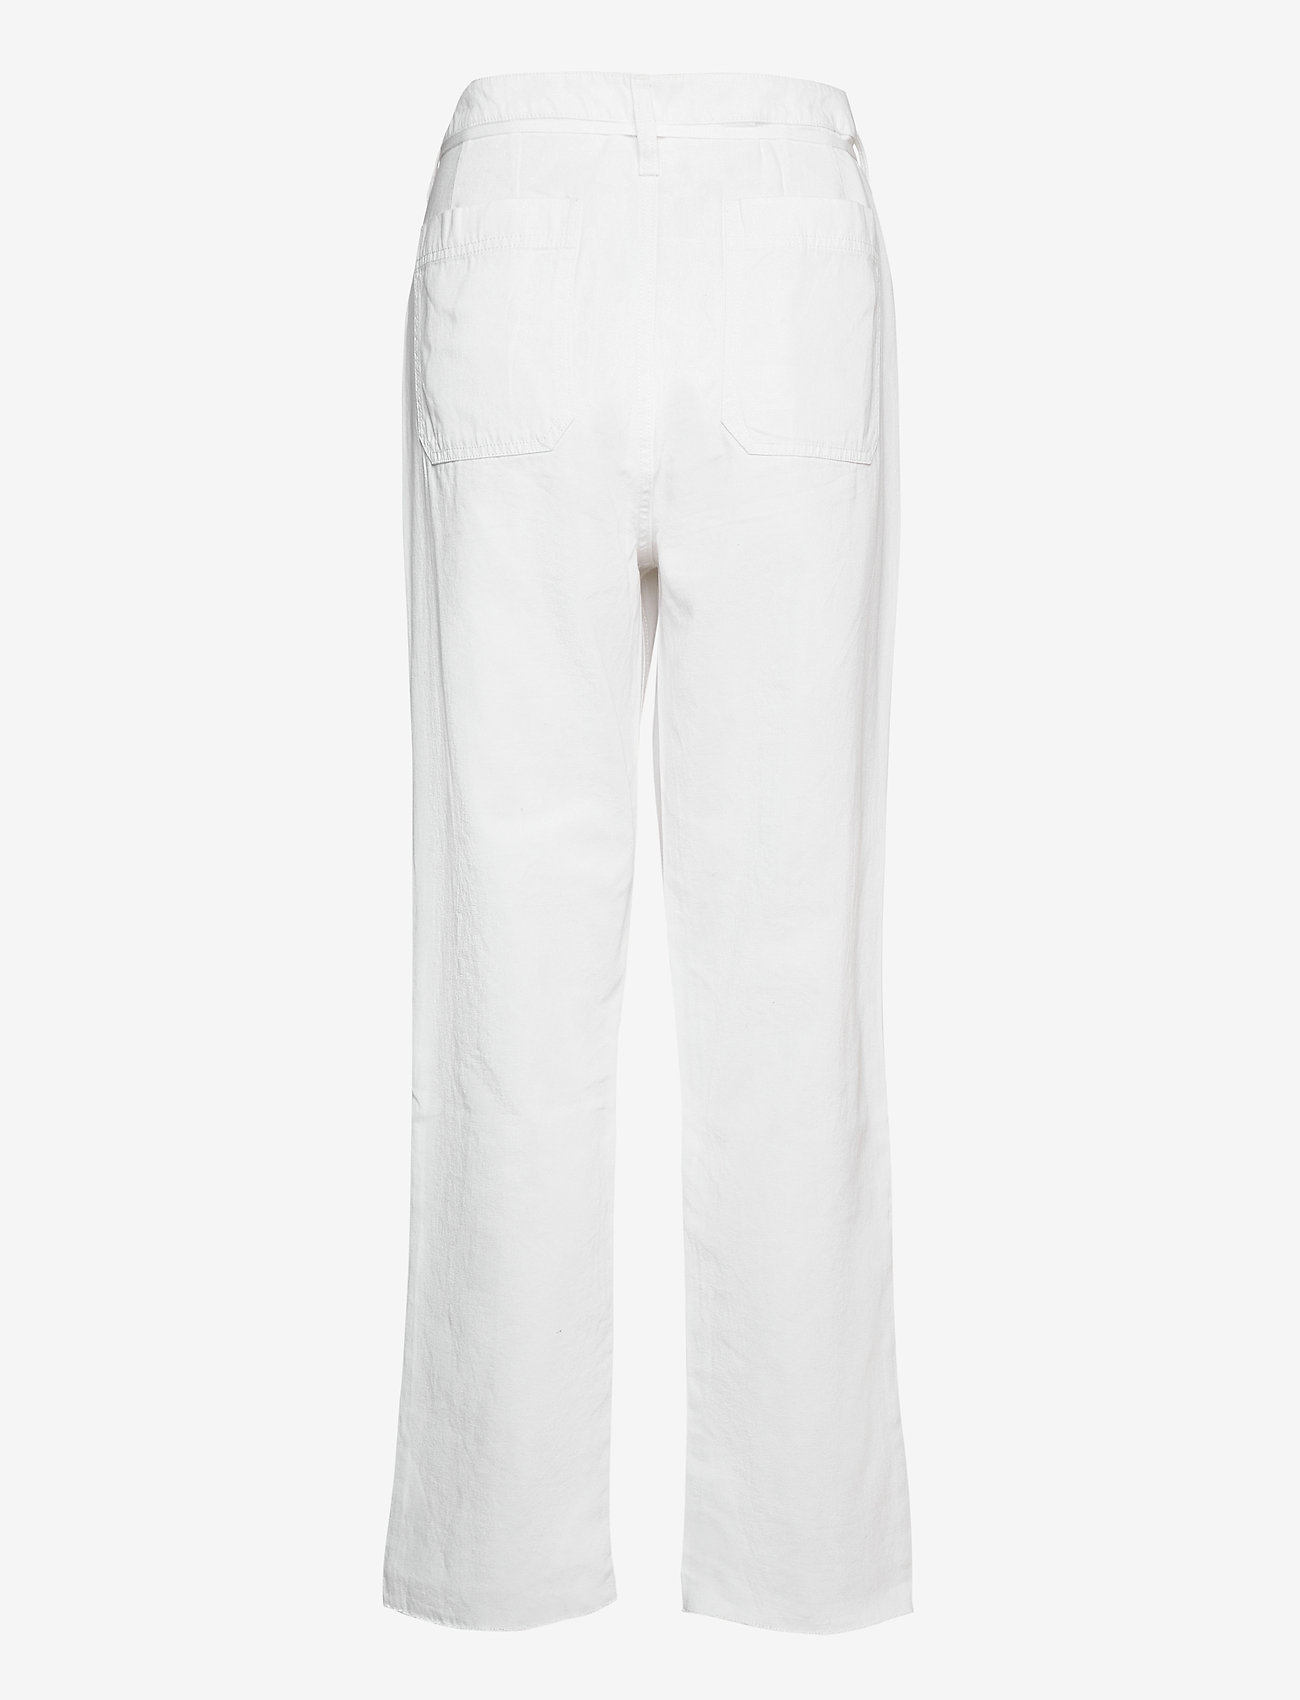 VANS - MAKE ME YOUR OWN PANT - sportbroeken - white - 1